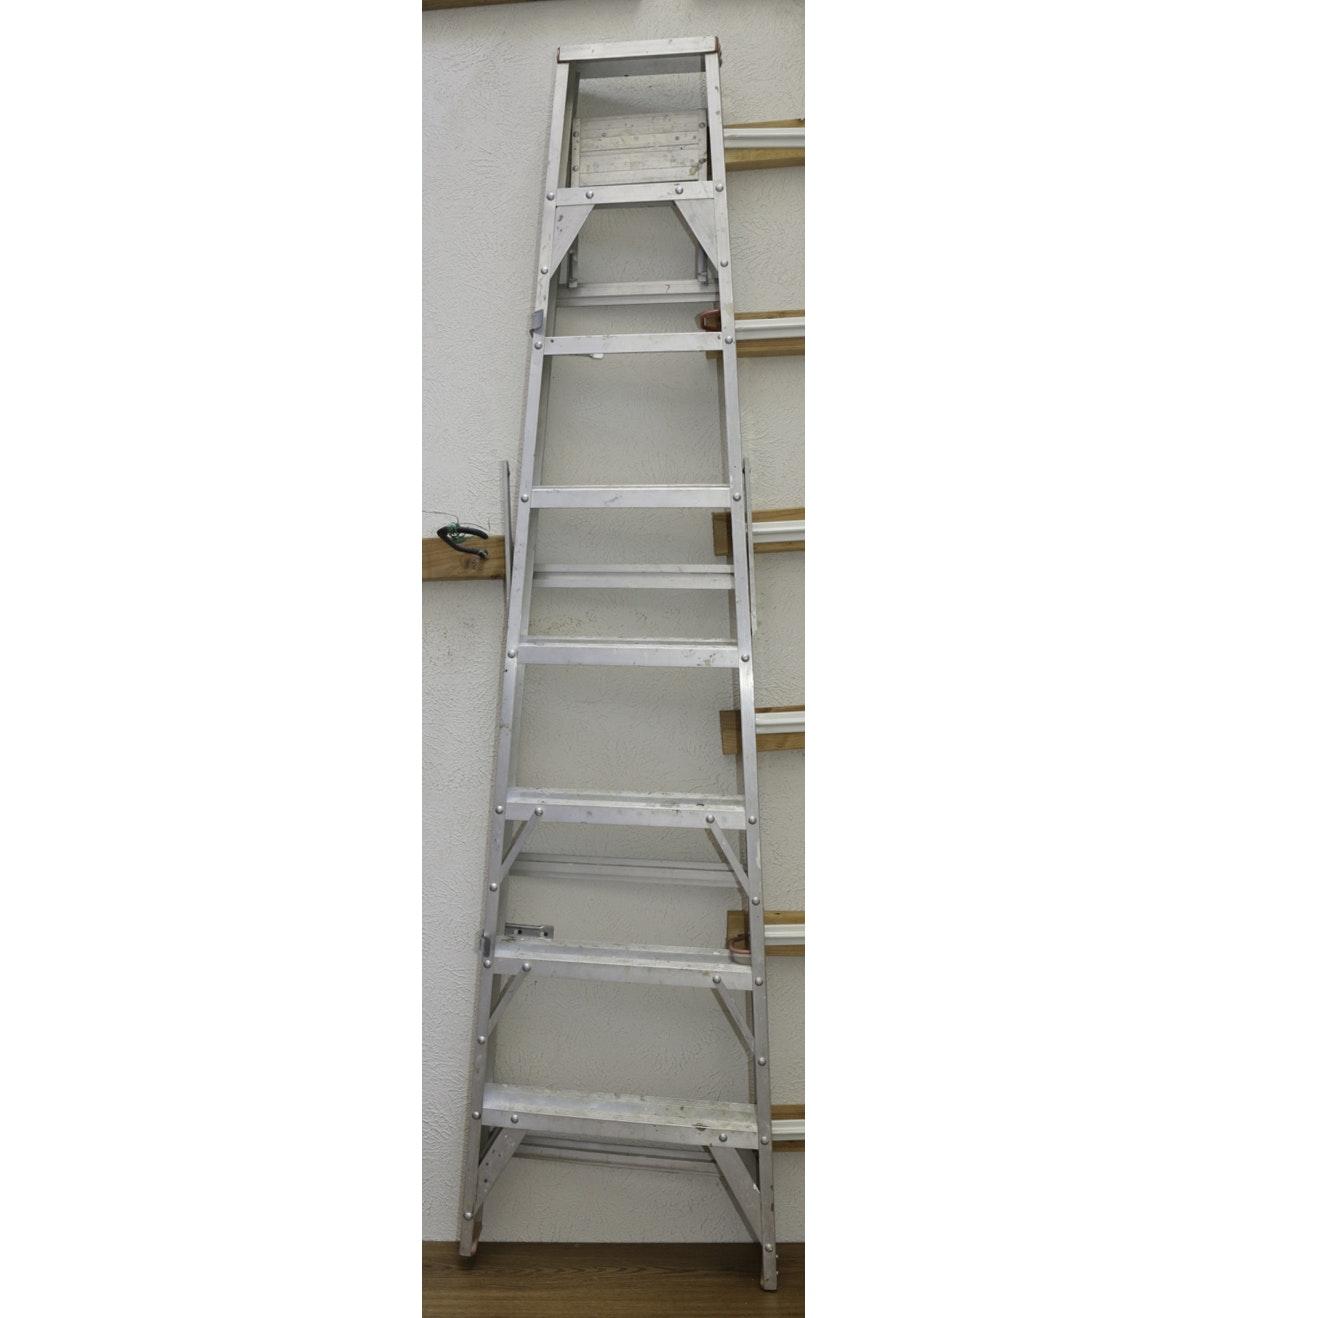 Folding A-Frame Aluminum Ladder with Shelf